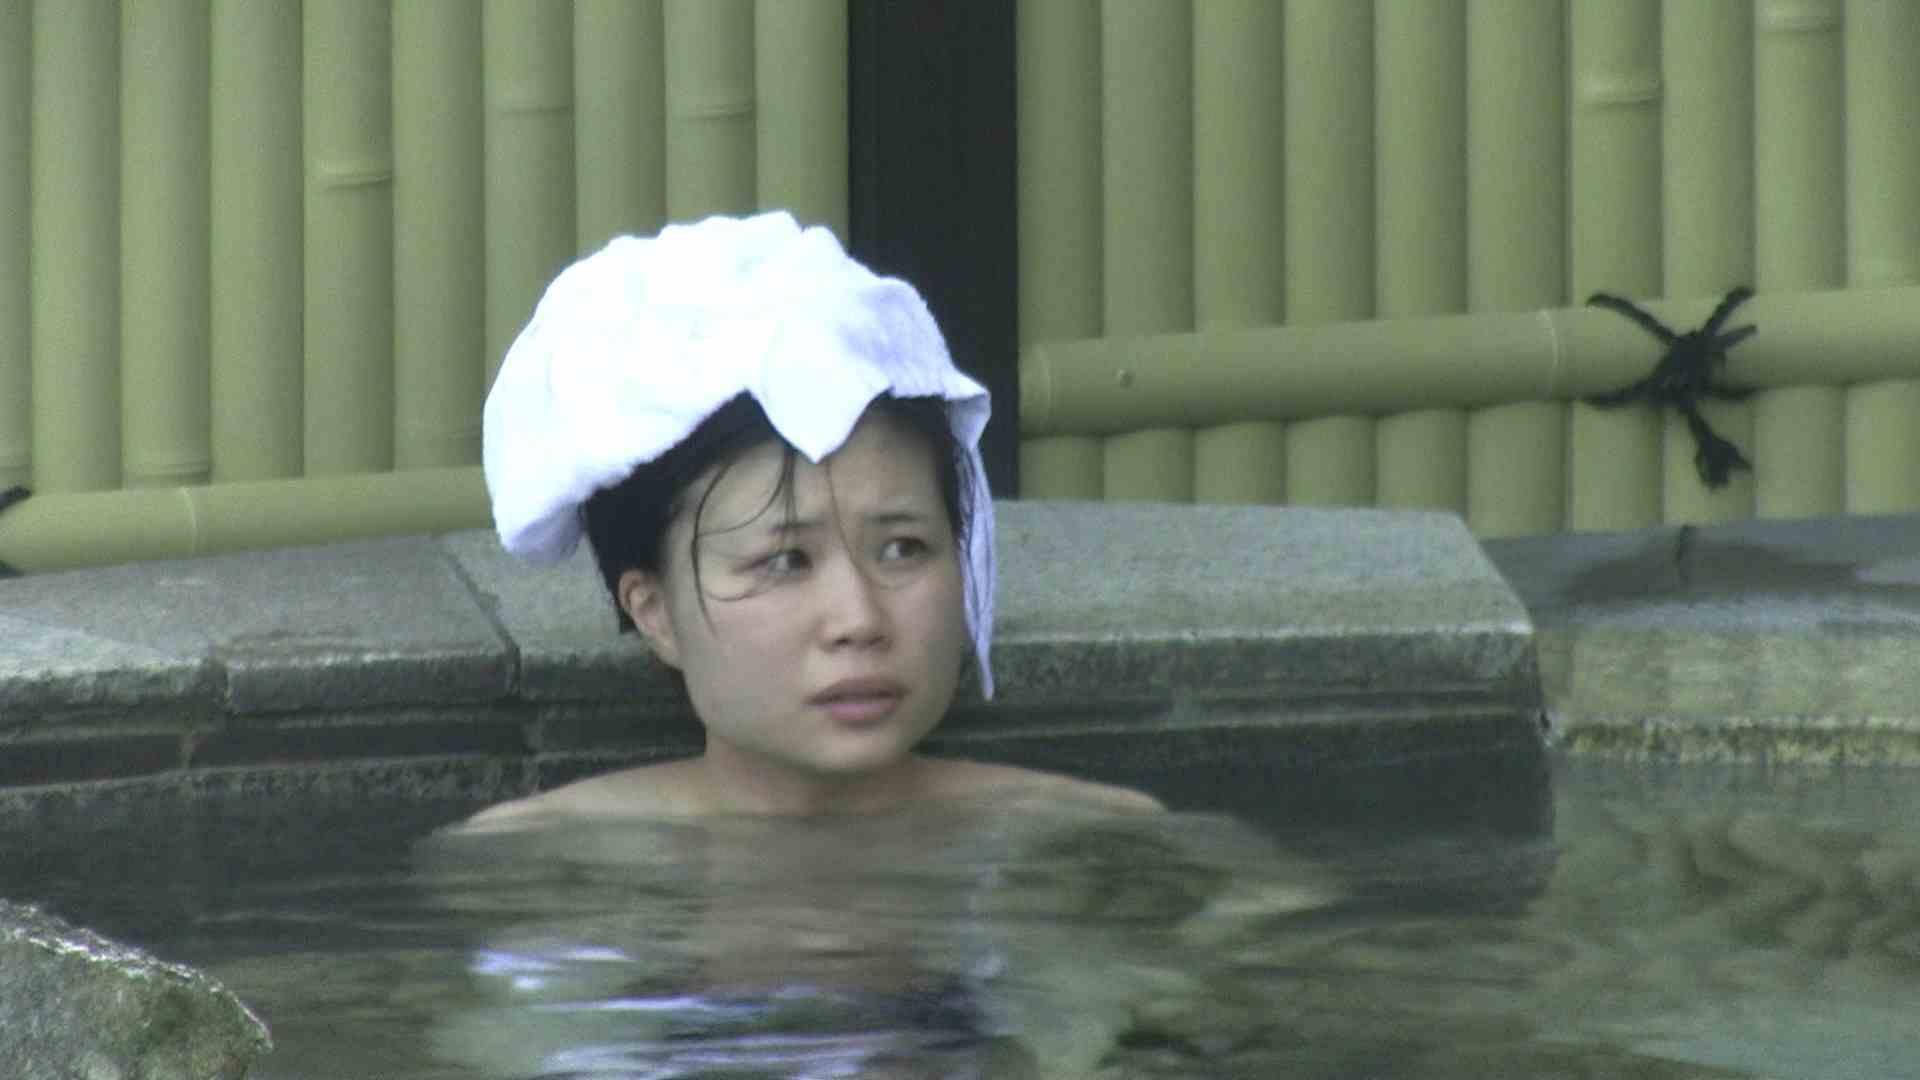 Aquaな露天風呂Vol.183 露天 濡れ場動画紹介 106pic 69